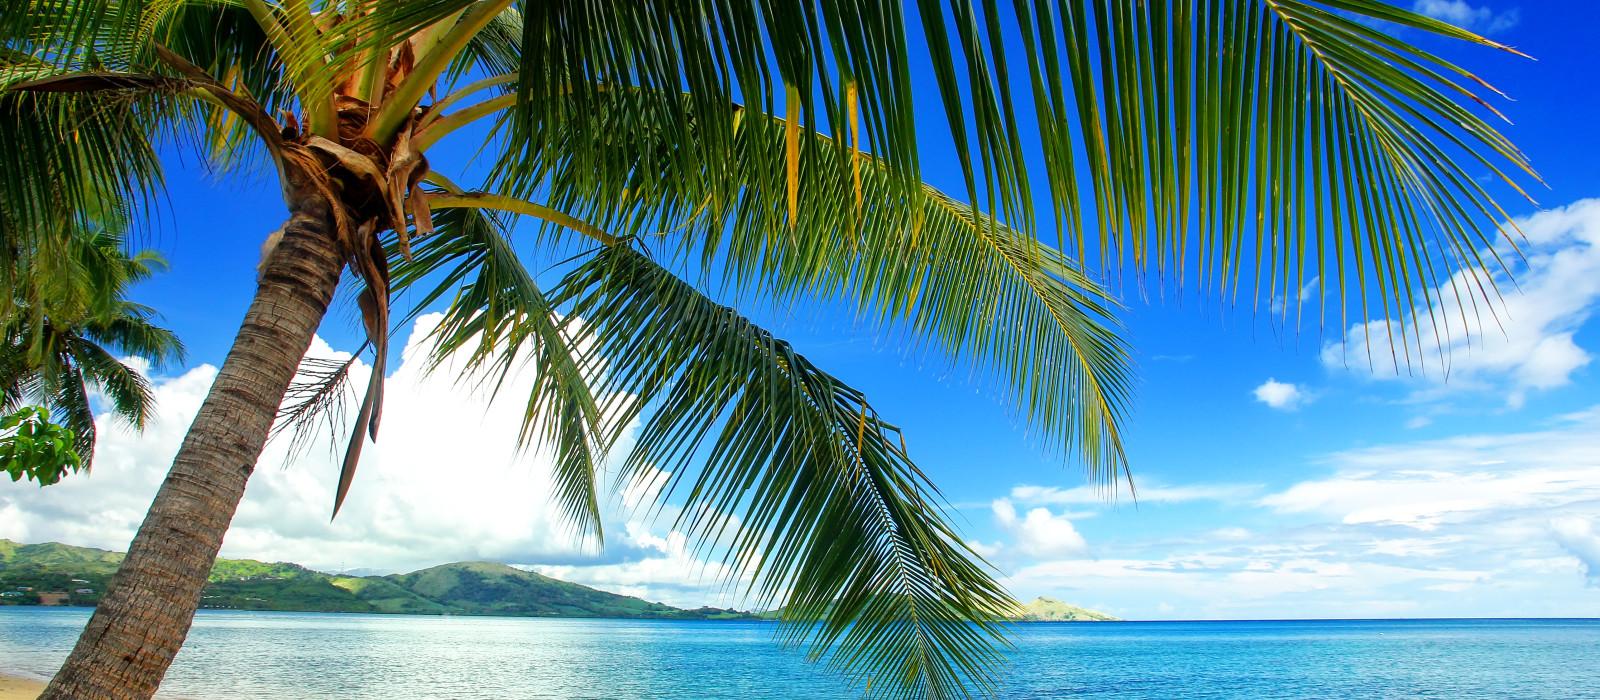 Destination Rakiraki Fiji